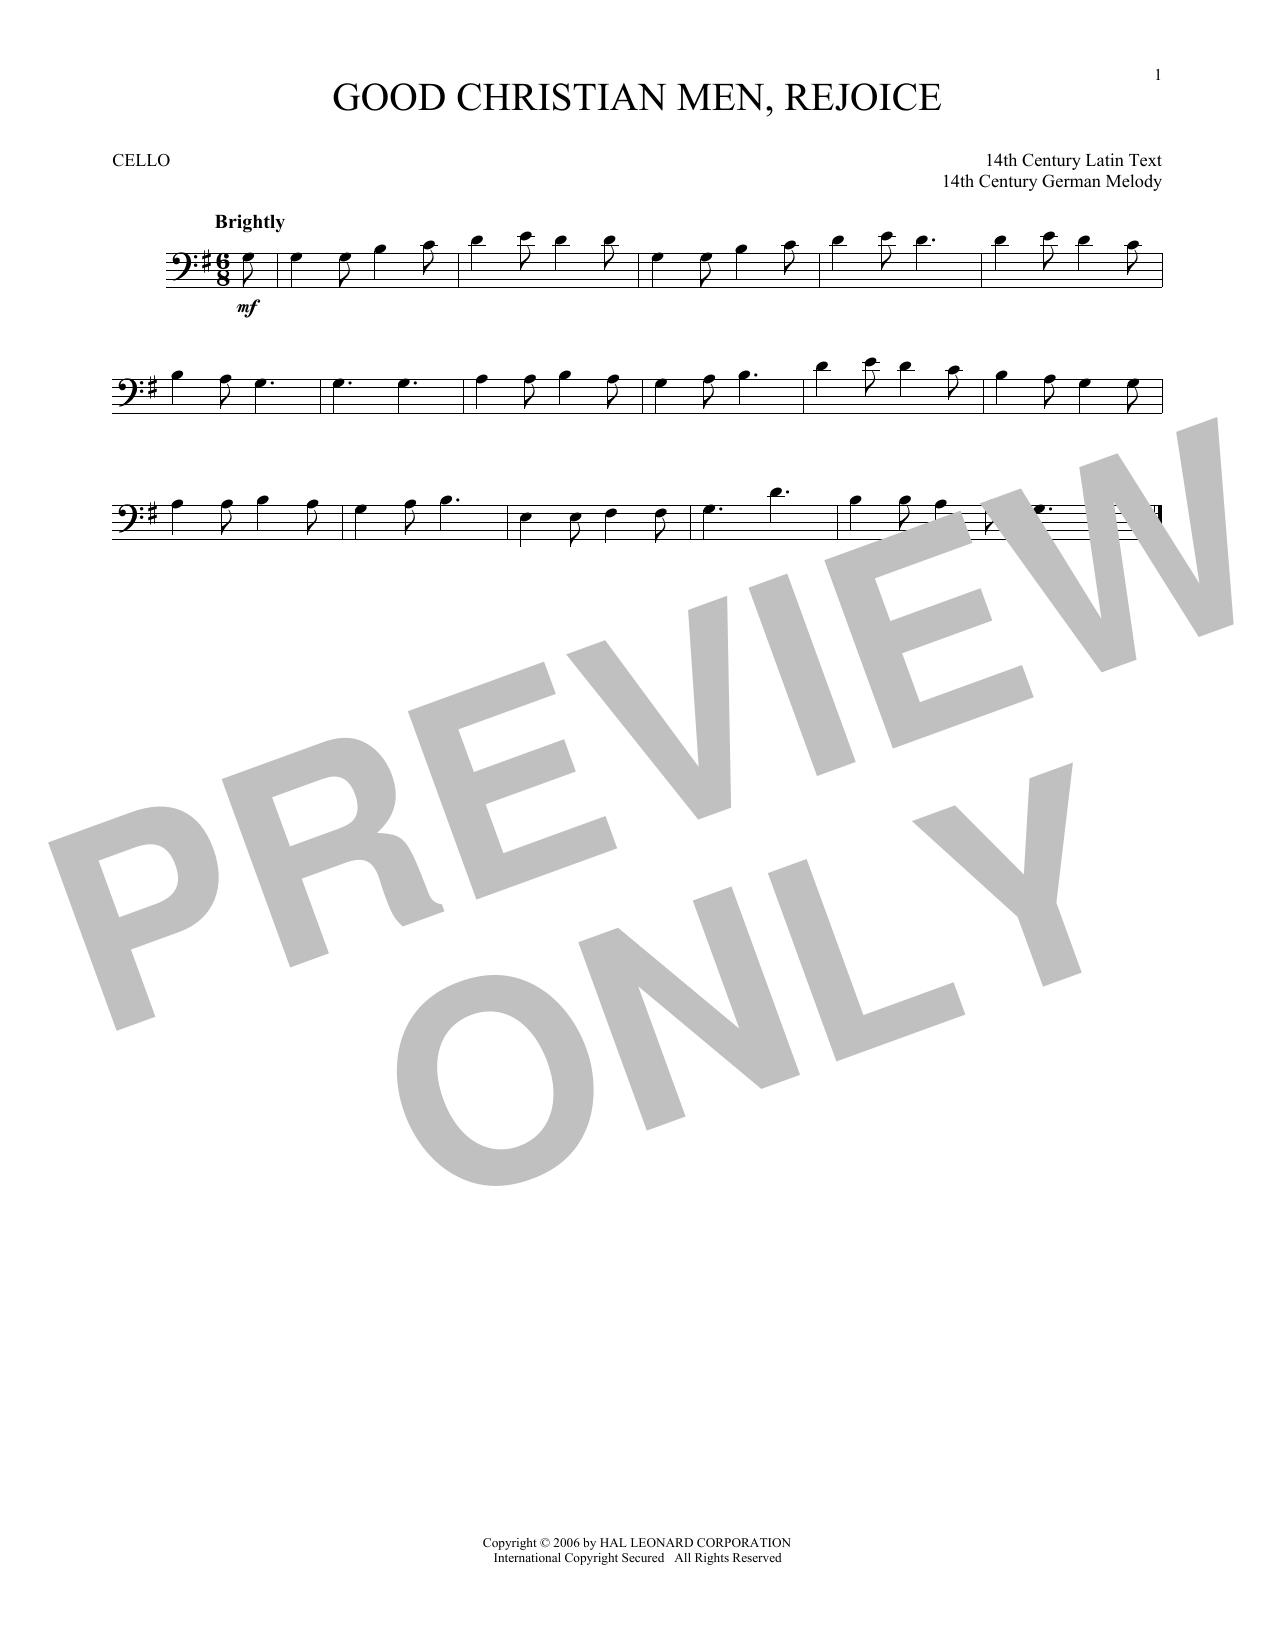 Good Christian Men, Rejoice (Cello Solo)